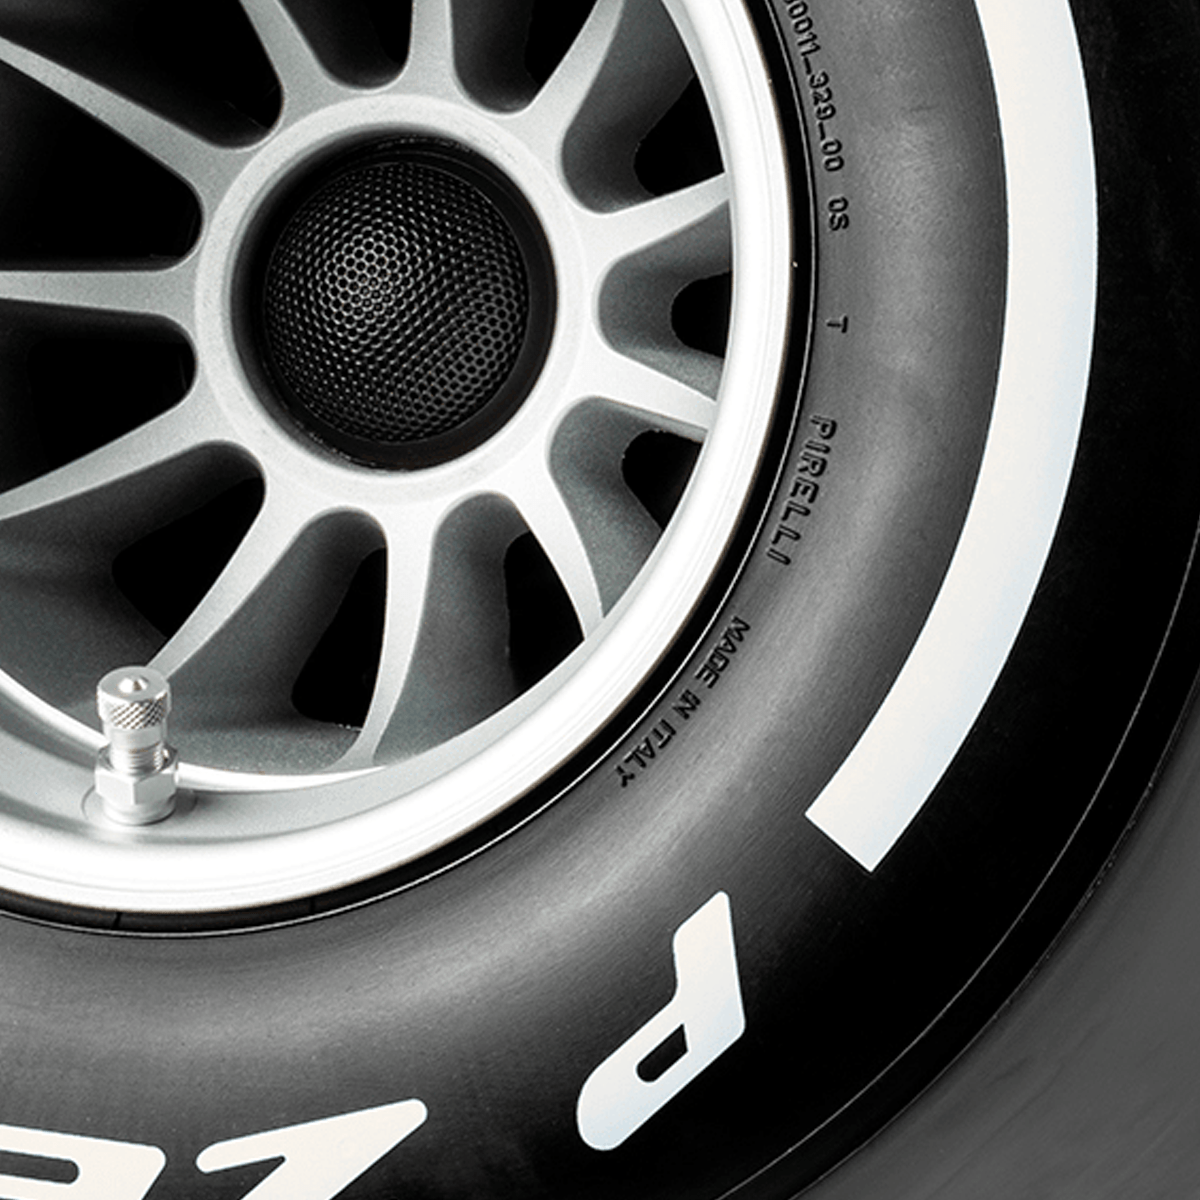 Pirelli P ZERO™ casse audio colore bianco